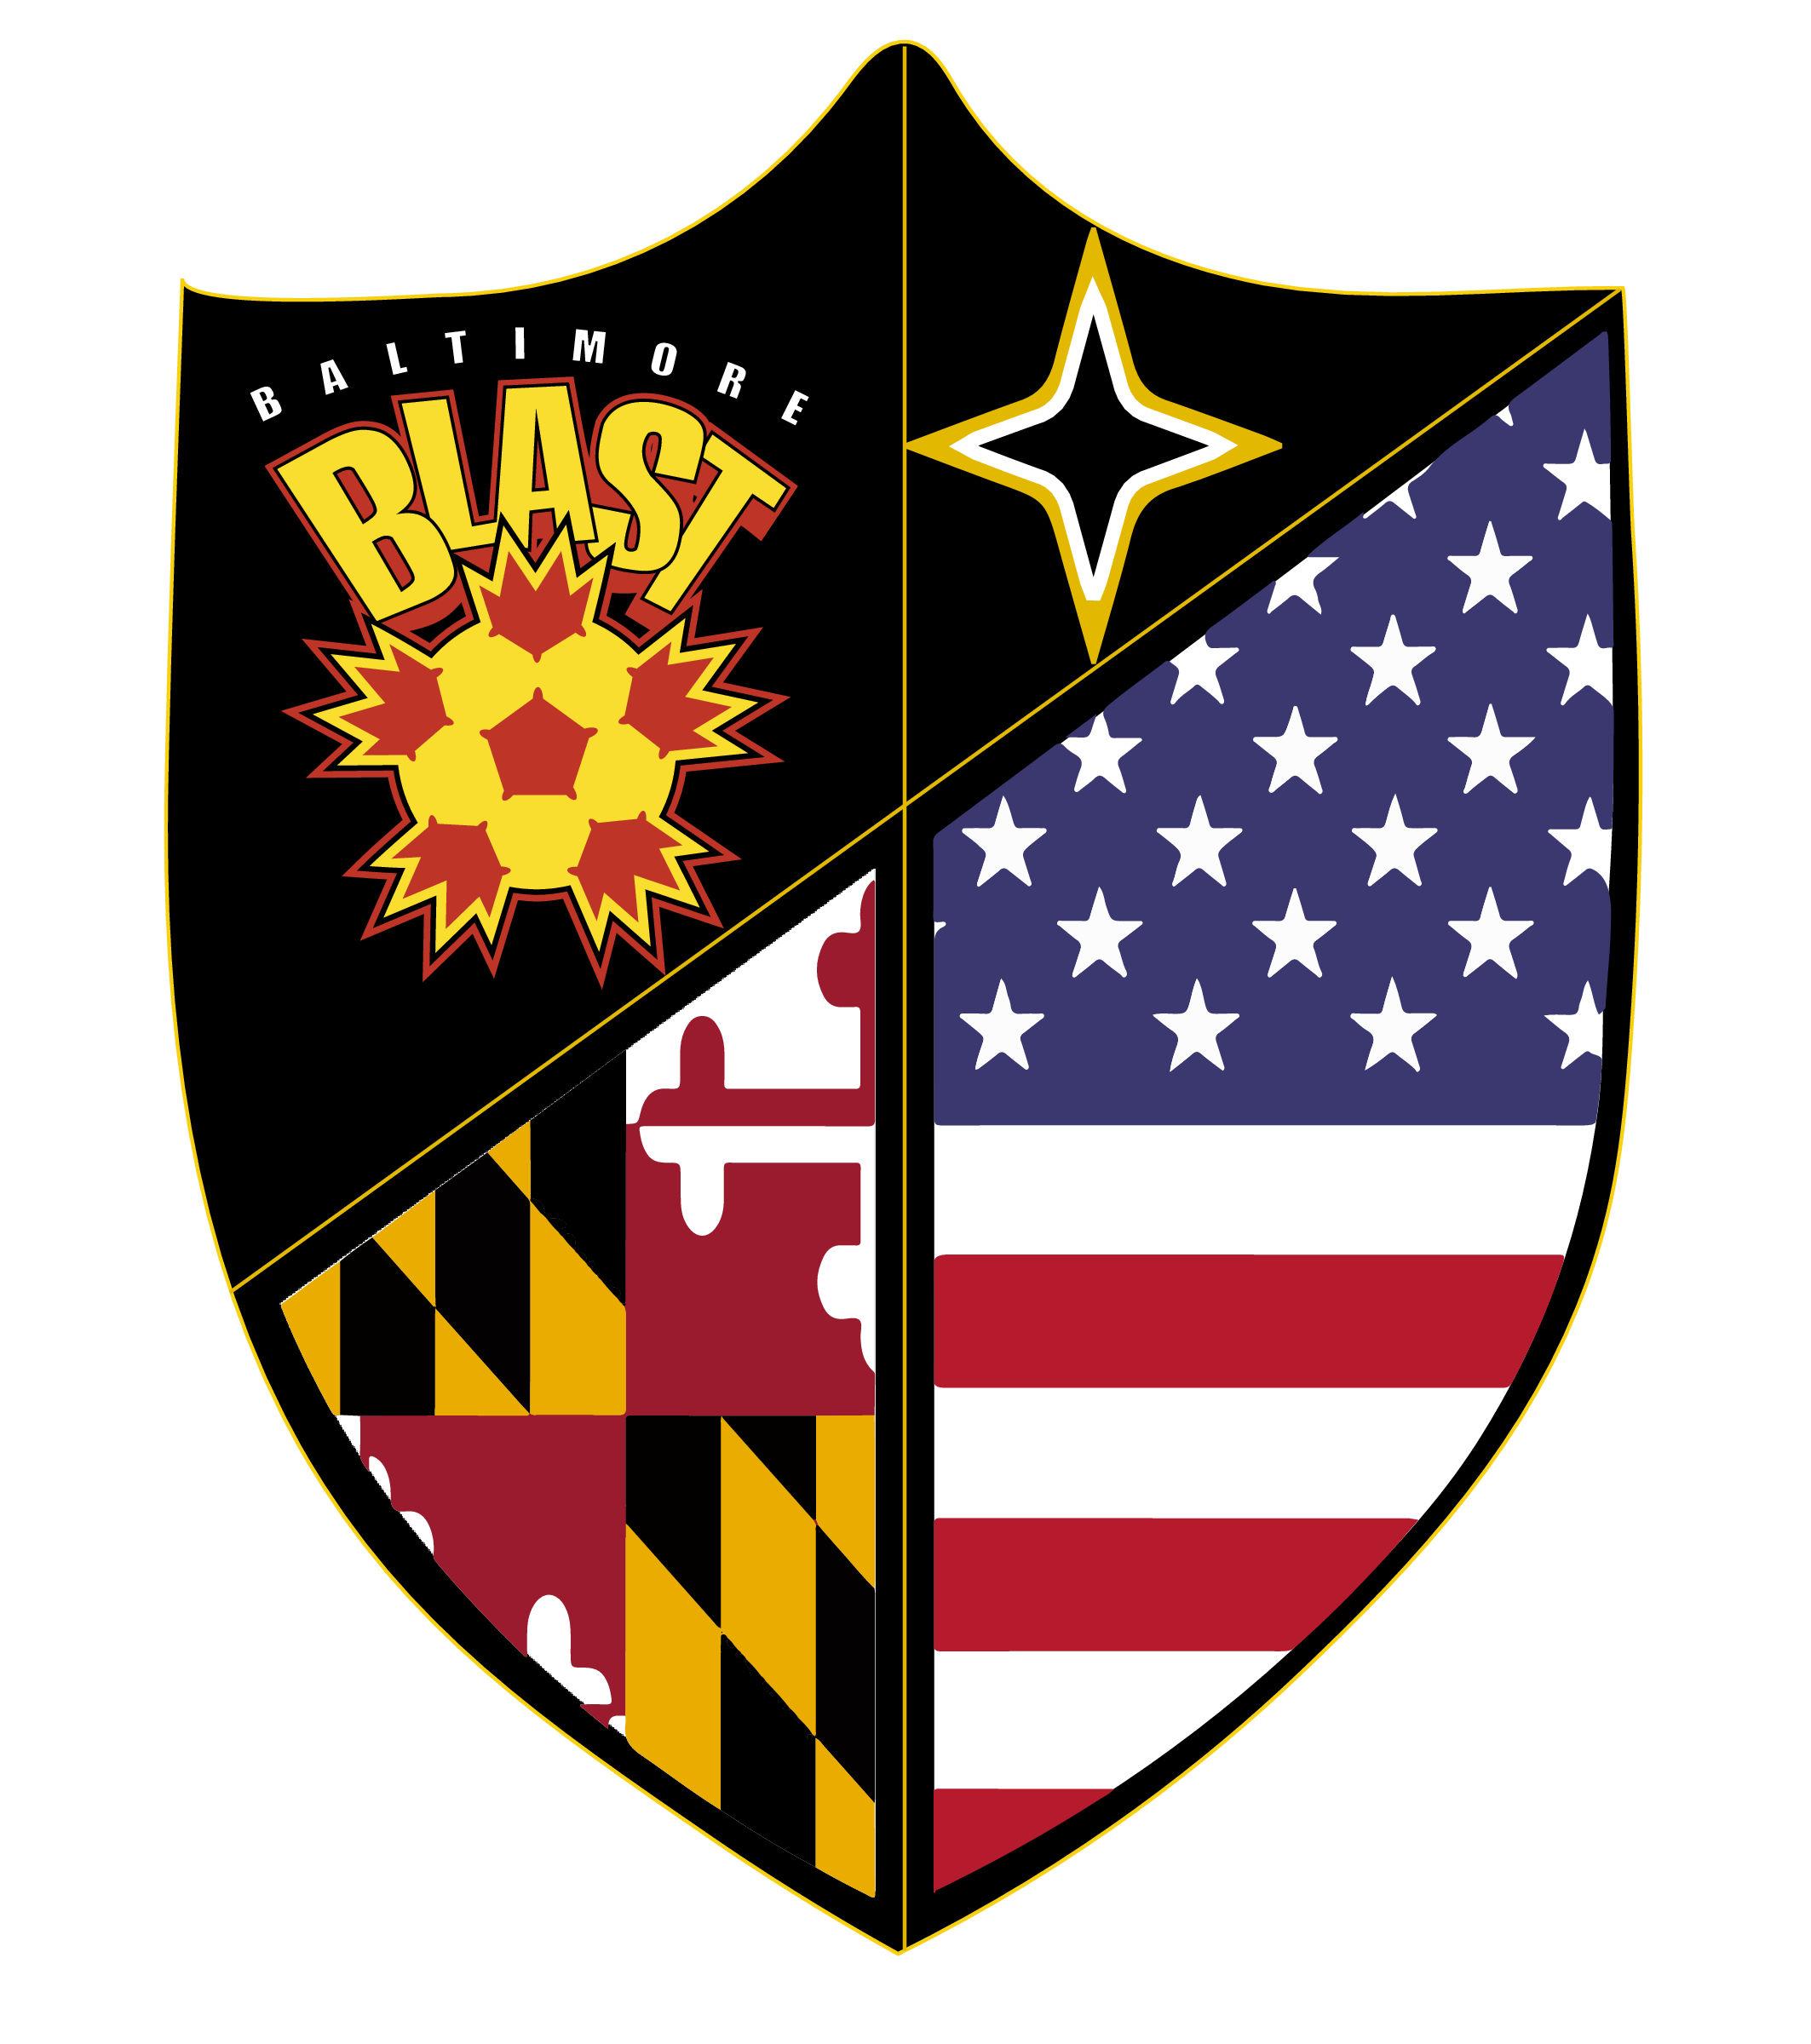 Blatimore Blast Final Logo